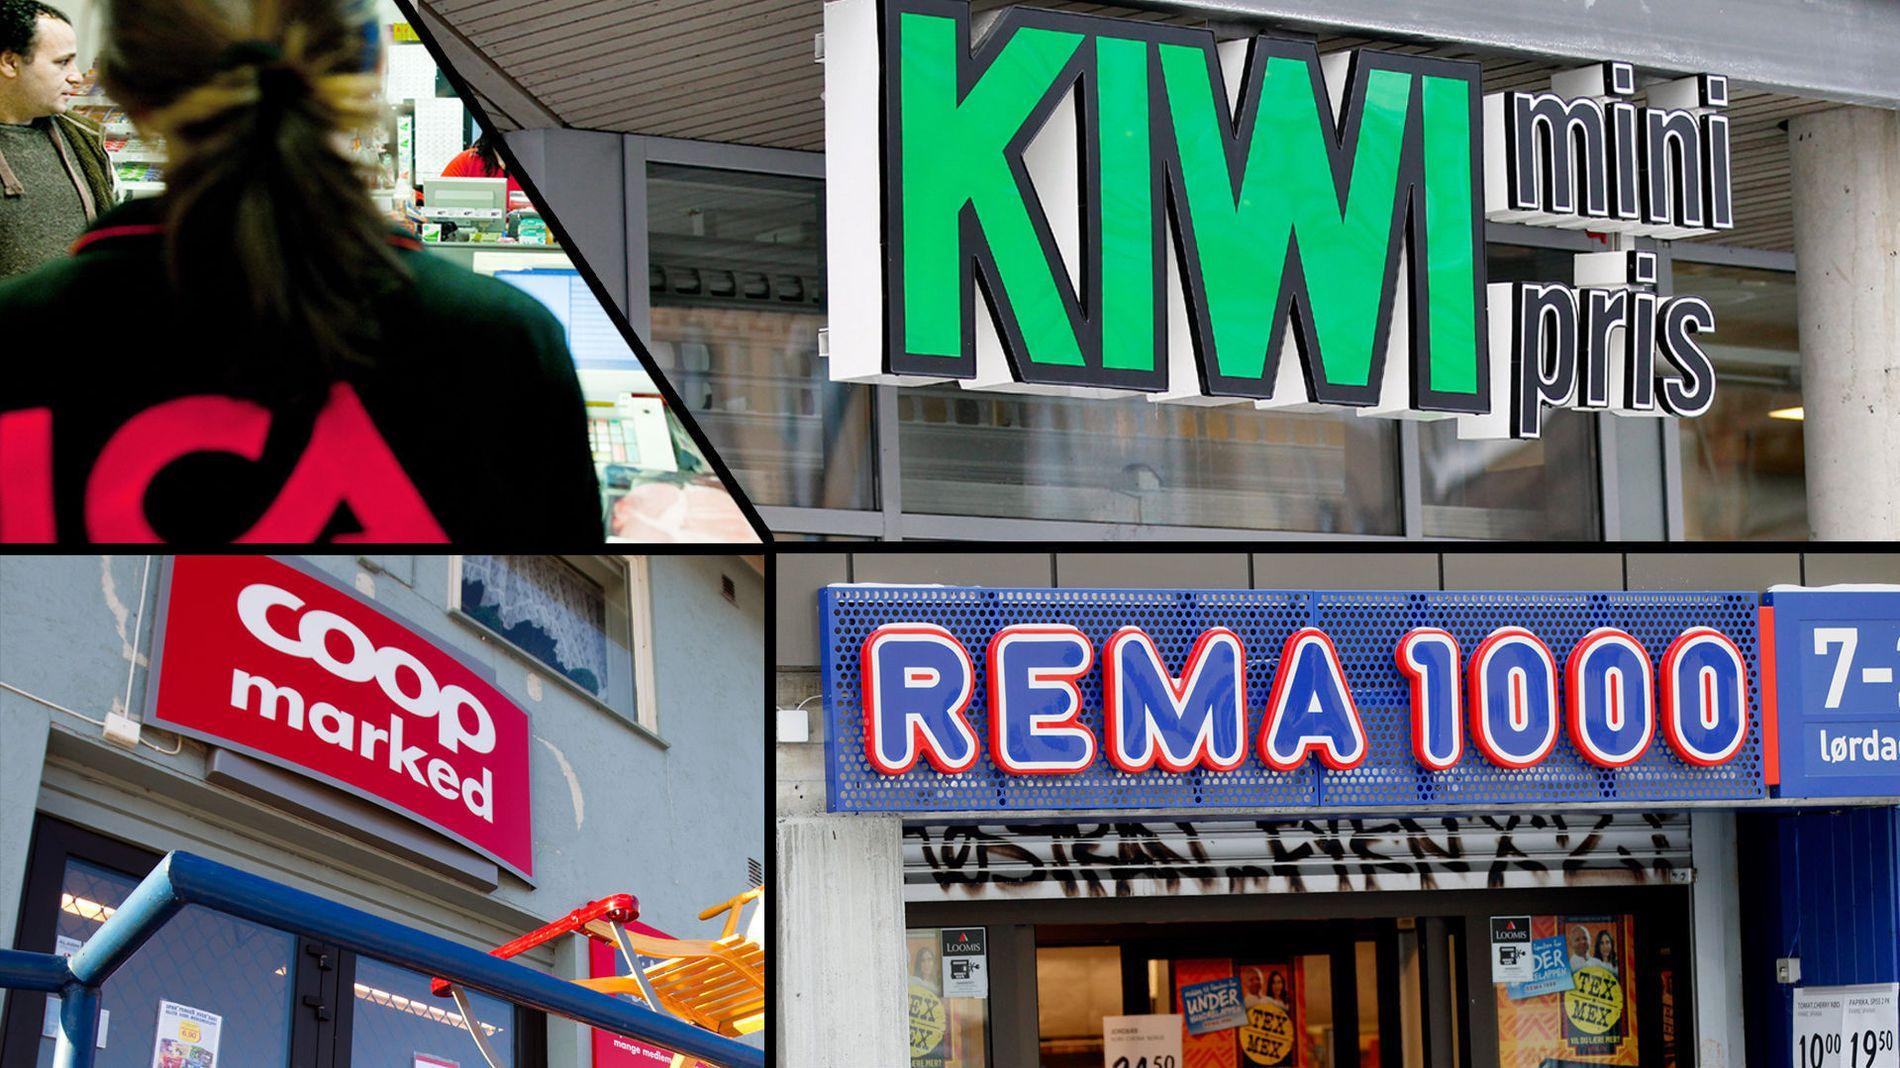 57bee4629 Tror 1.000 norske matbutikker vil dø